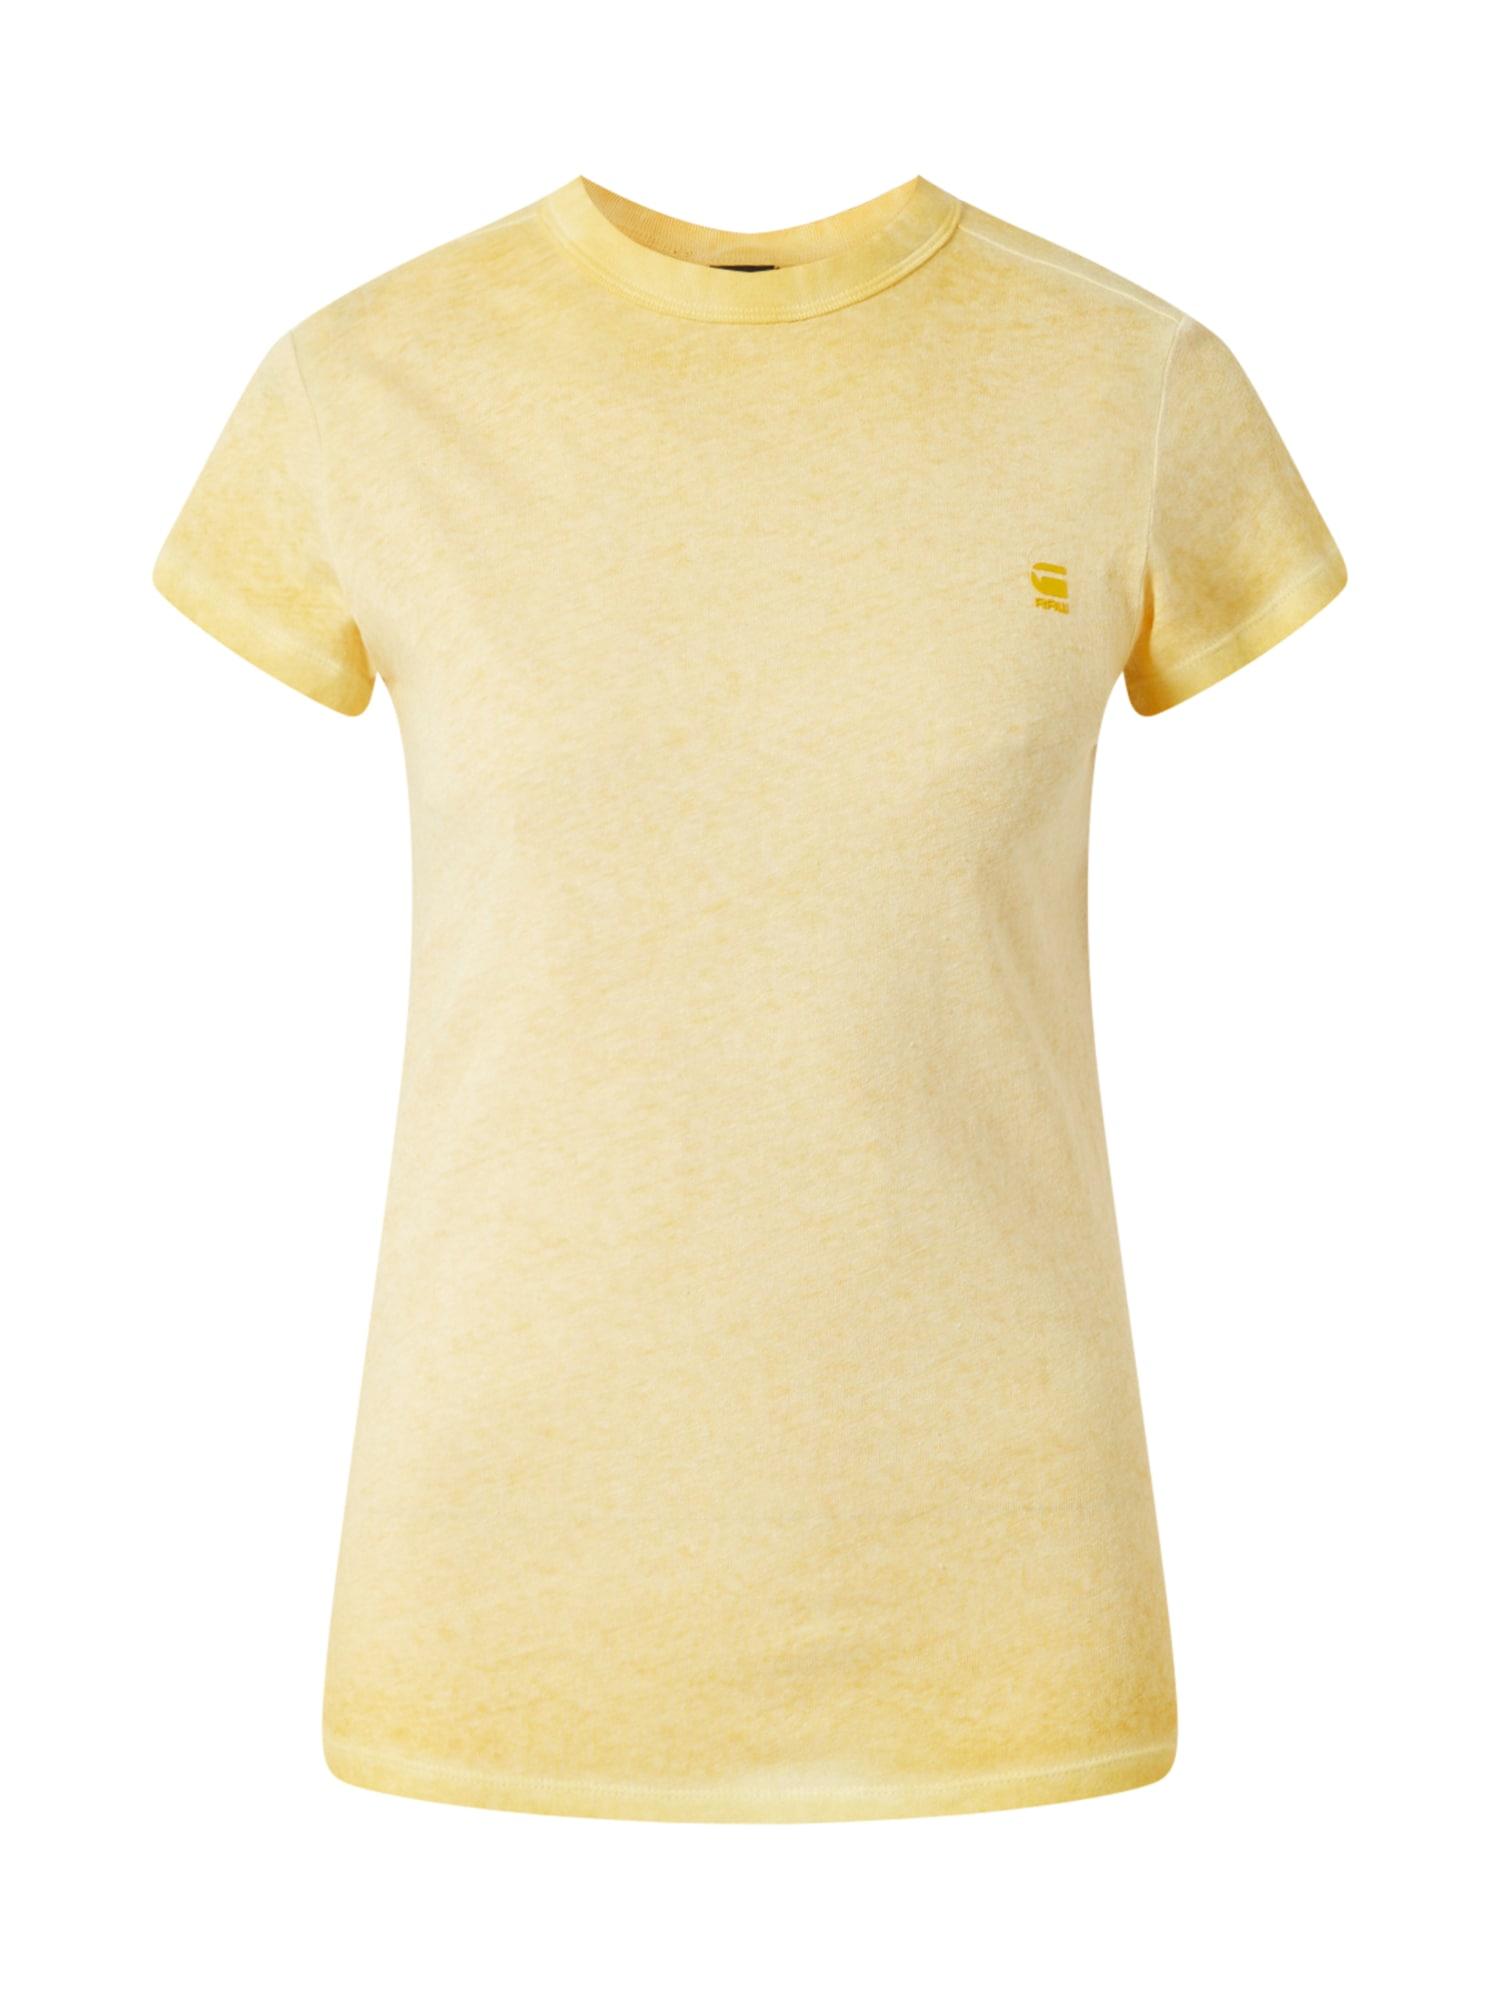 G-Star RAW Tričko 'Eyber'  žlté